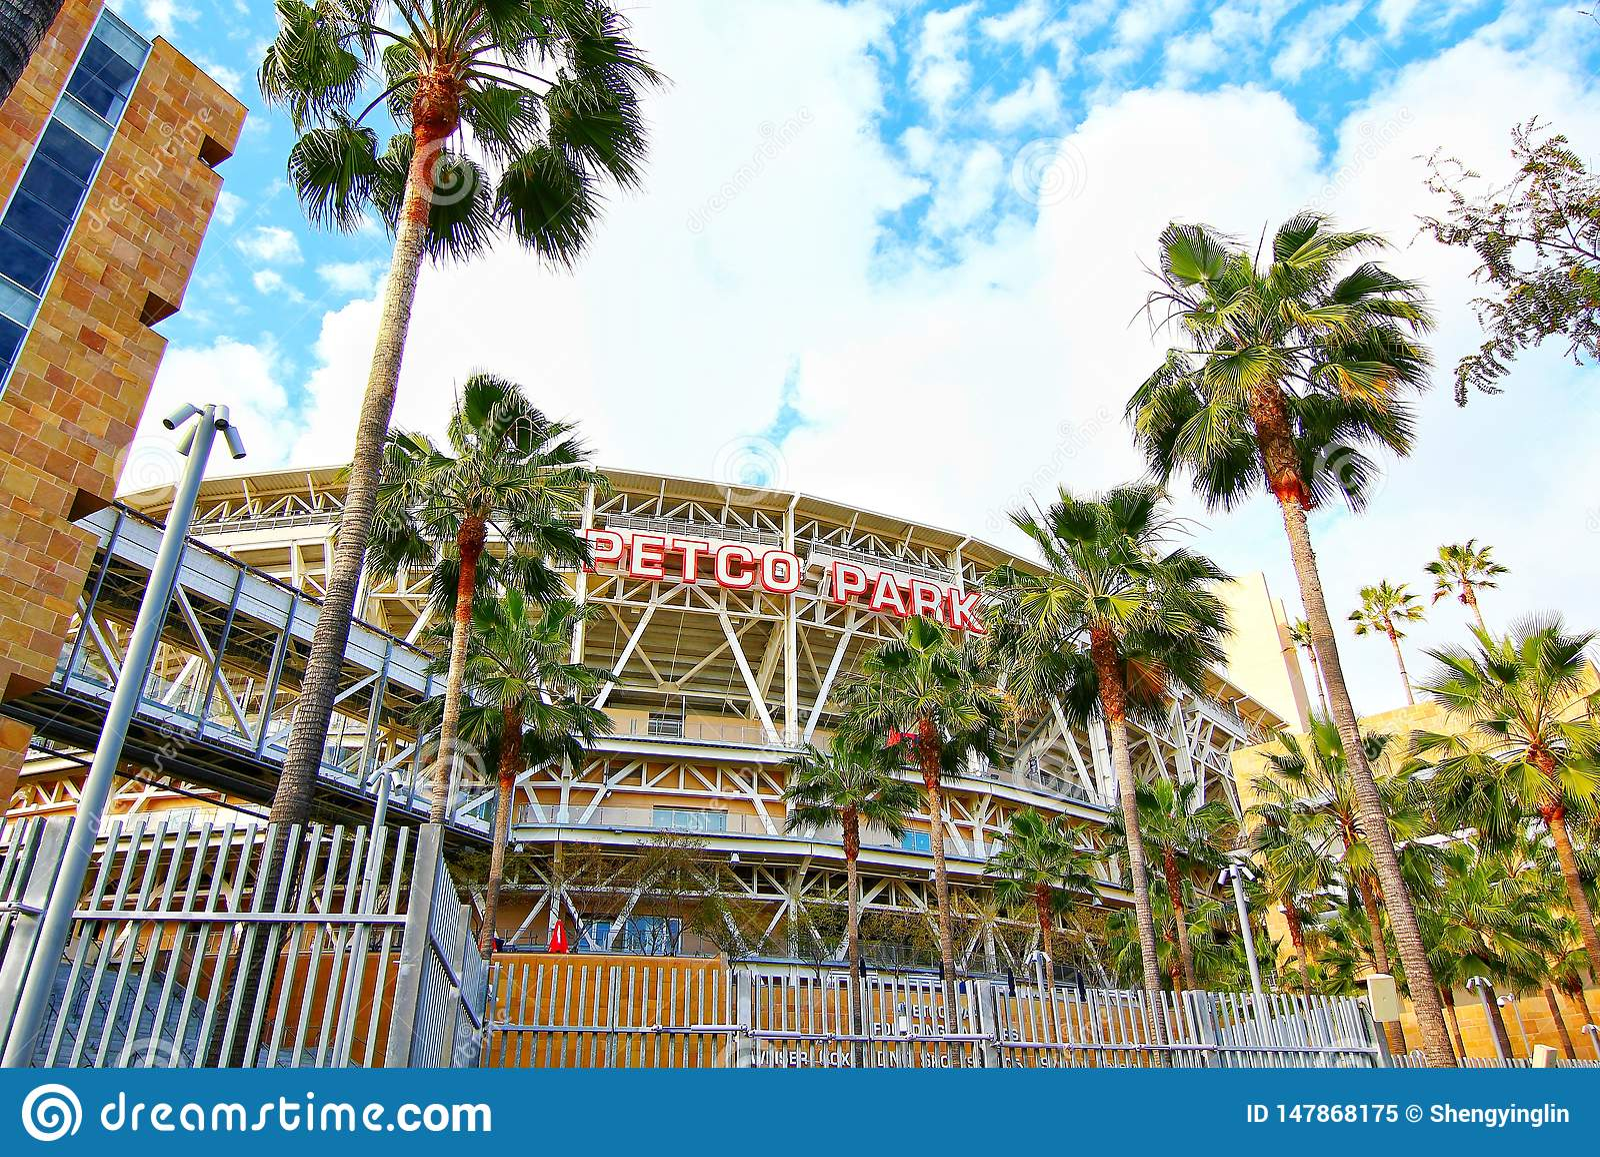 The Petco Park Baseball Stadium